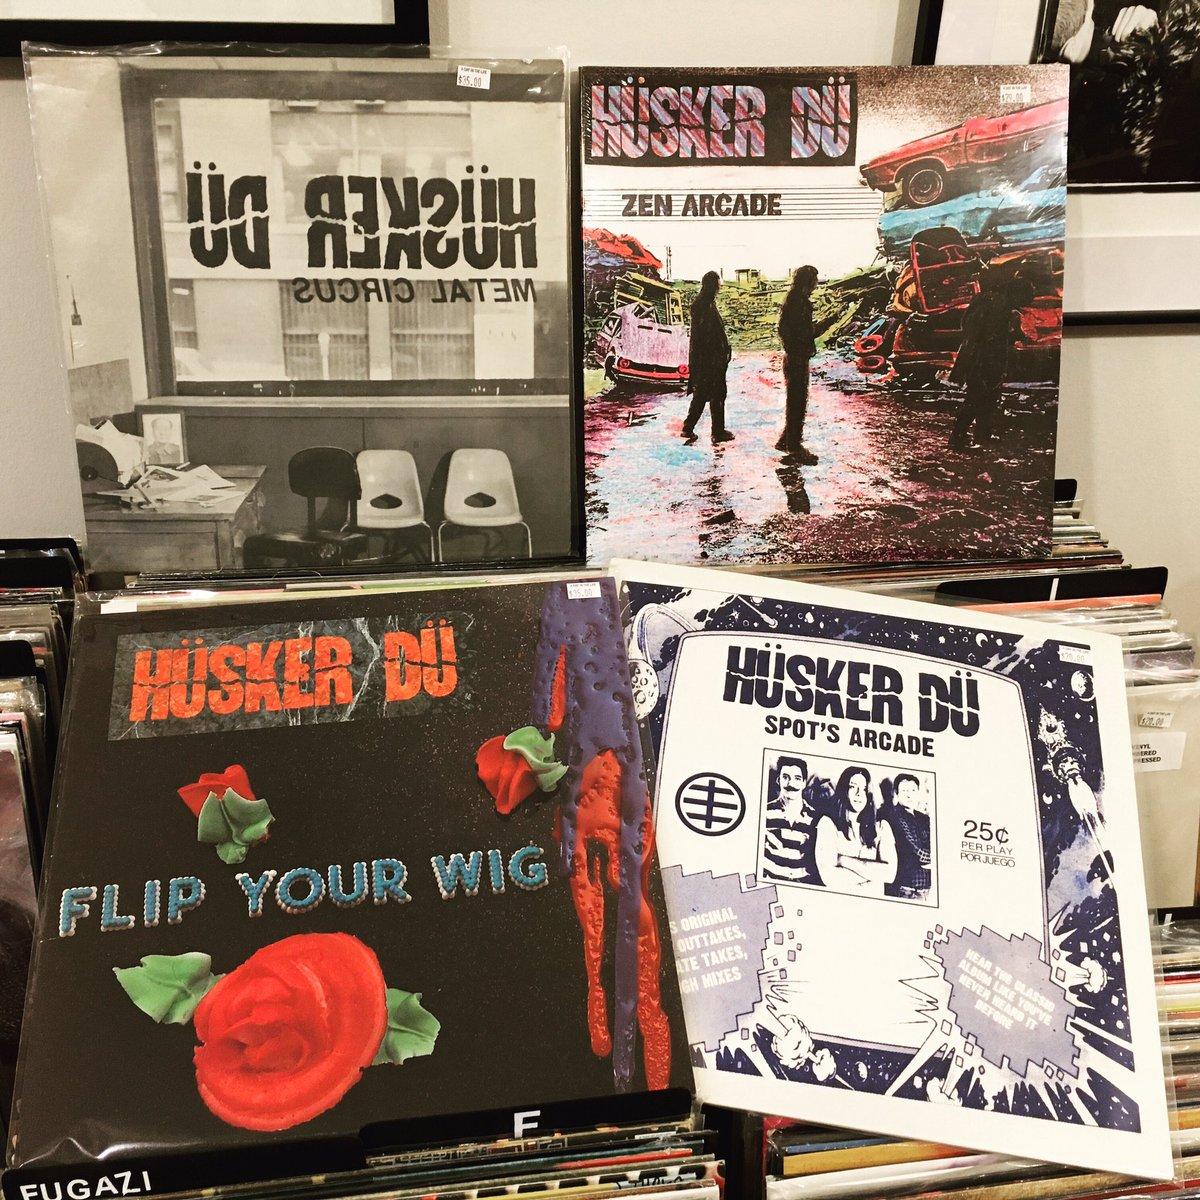 Lots of Hüsker goodness in the racks right now. #huskerdu #punk #punkhardcore #punkrecords #minneapolis #sstrecords #vinyl #nowplaying #supportsmallbusiness  #records #recordshop  #lancastercity #adayintheliferecords #aditlrecords #cratediggingpic.twitter.com/PqaG2cE47Y